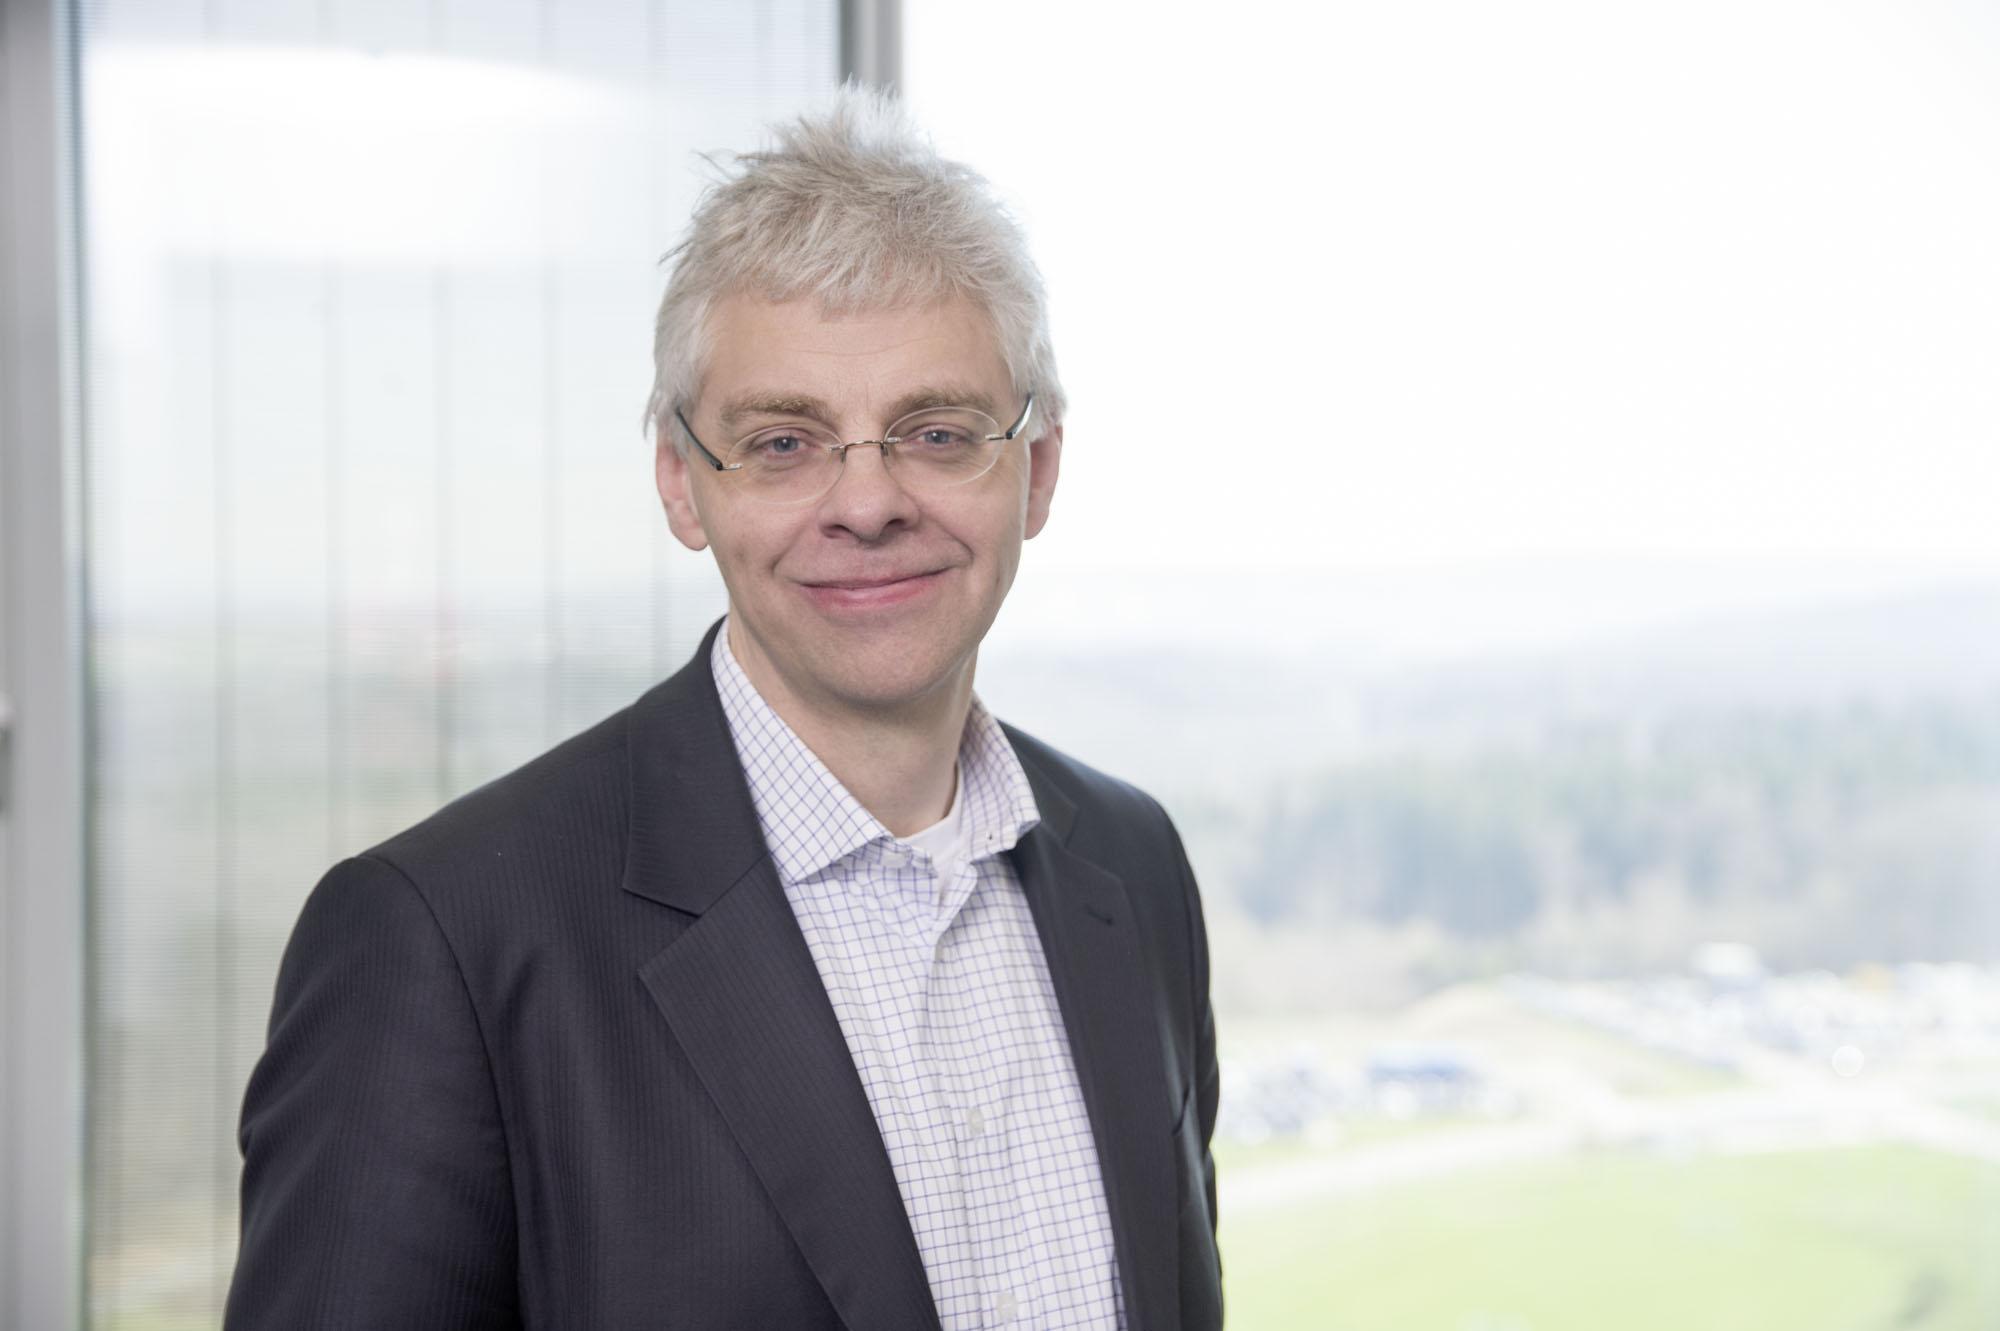 Christoph Peylo - Global Head of Bosch Center for Artificial Intelligence (BCAI)